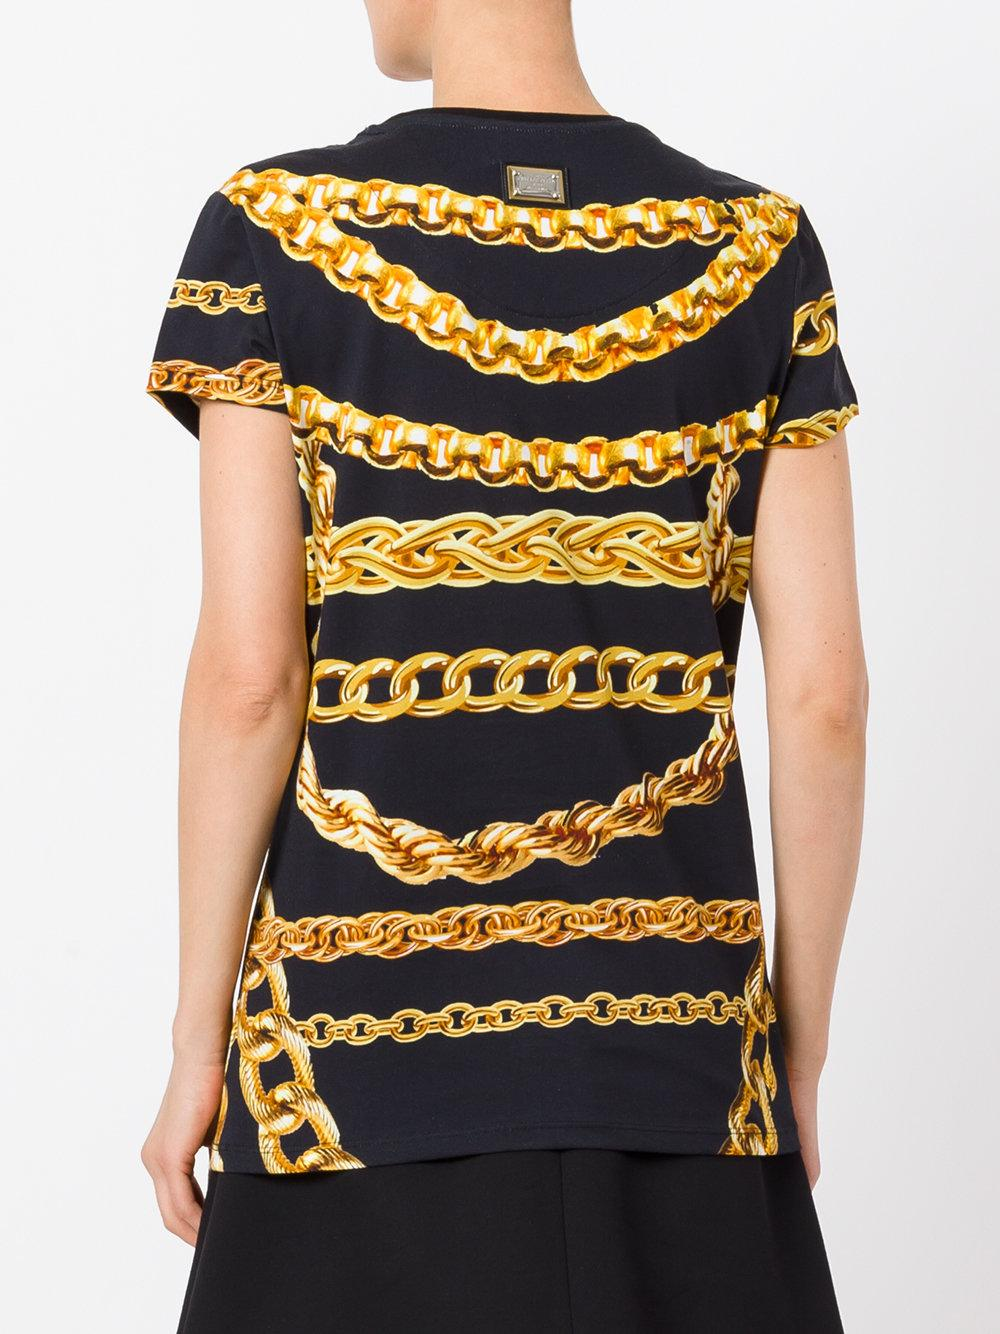 Philipp Plein Chain Print T Shirt In Black Lyst